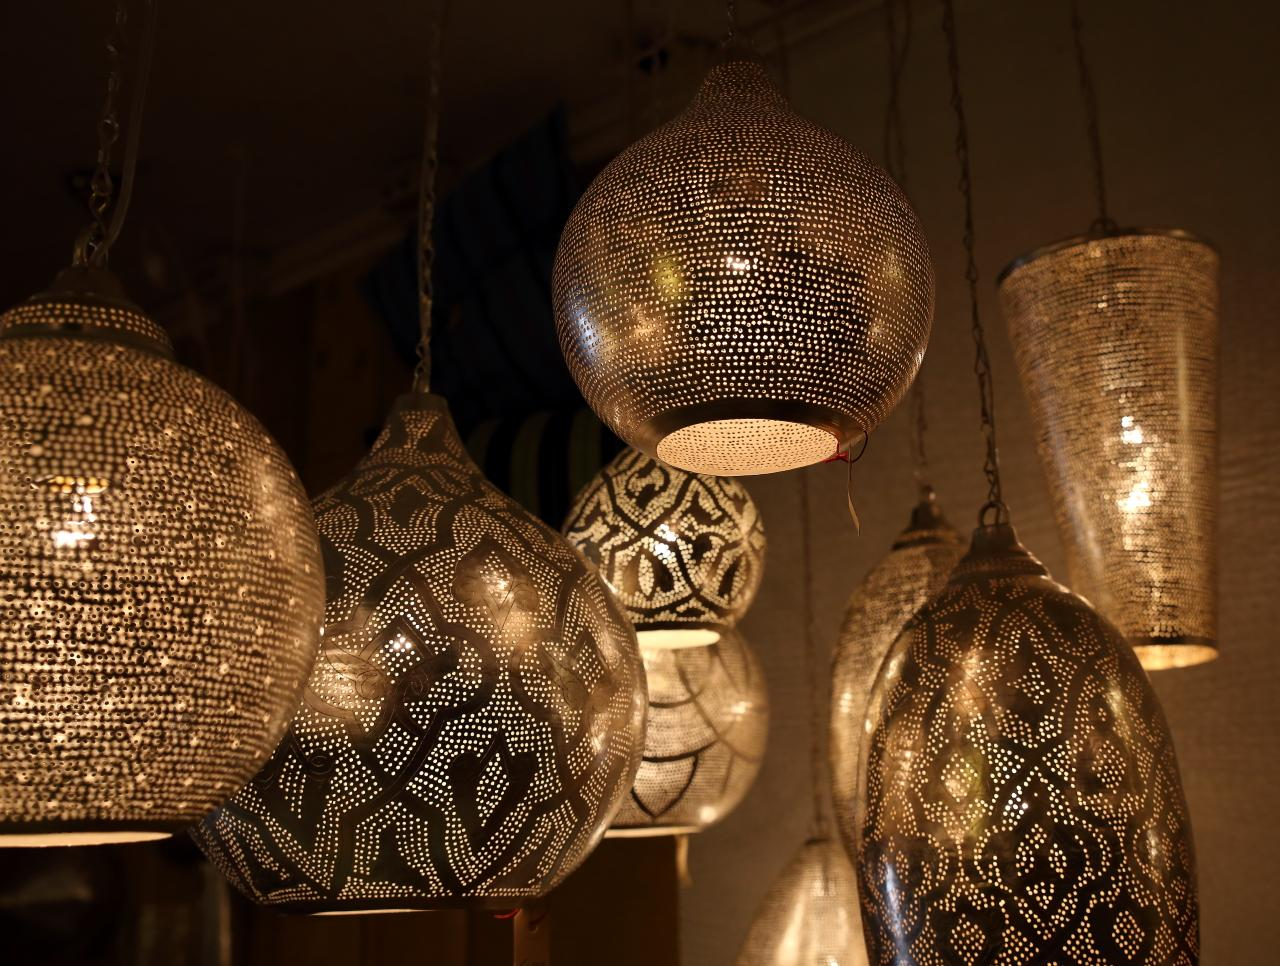 Marokkaanse Lampen Amersfoort : Kado wonen amersfoort hadaya interieurwinkel handwerk kado